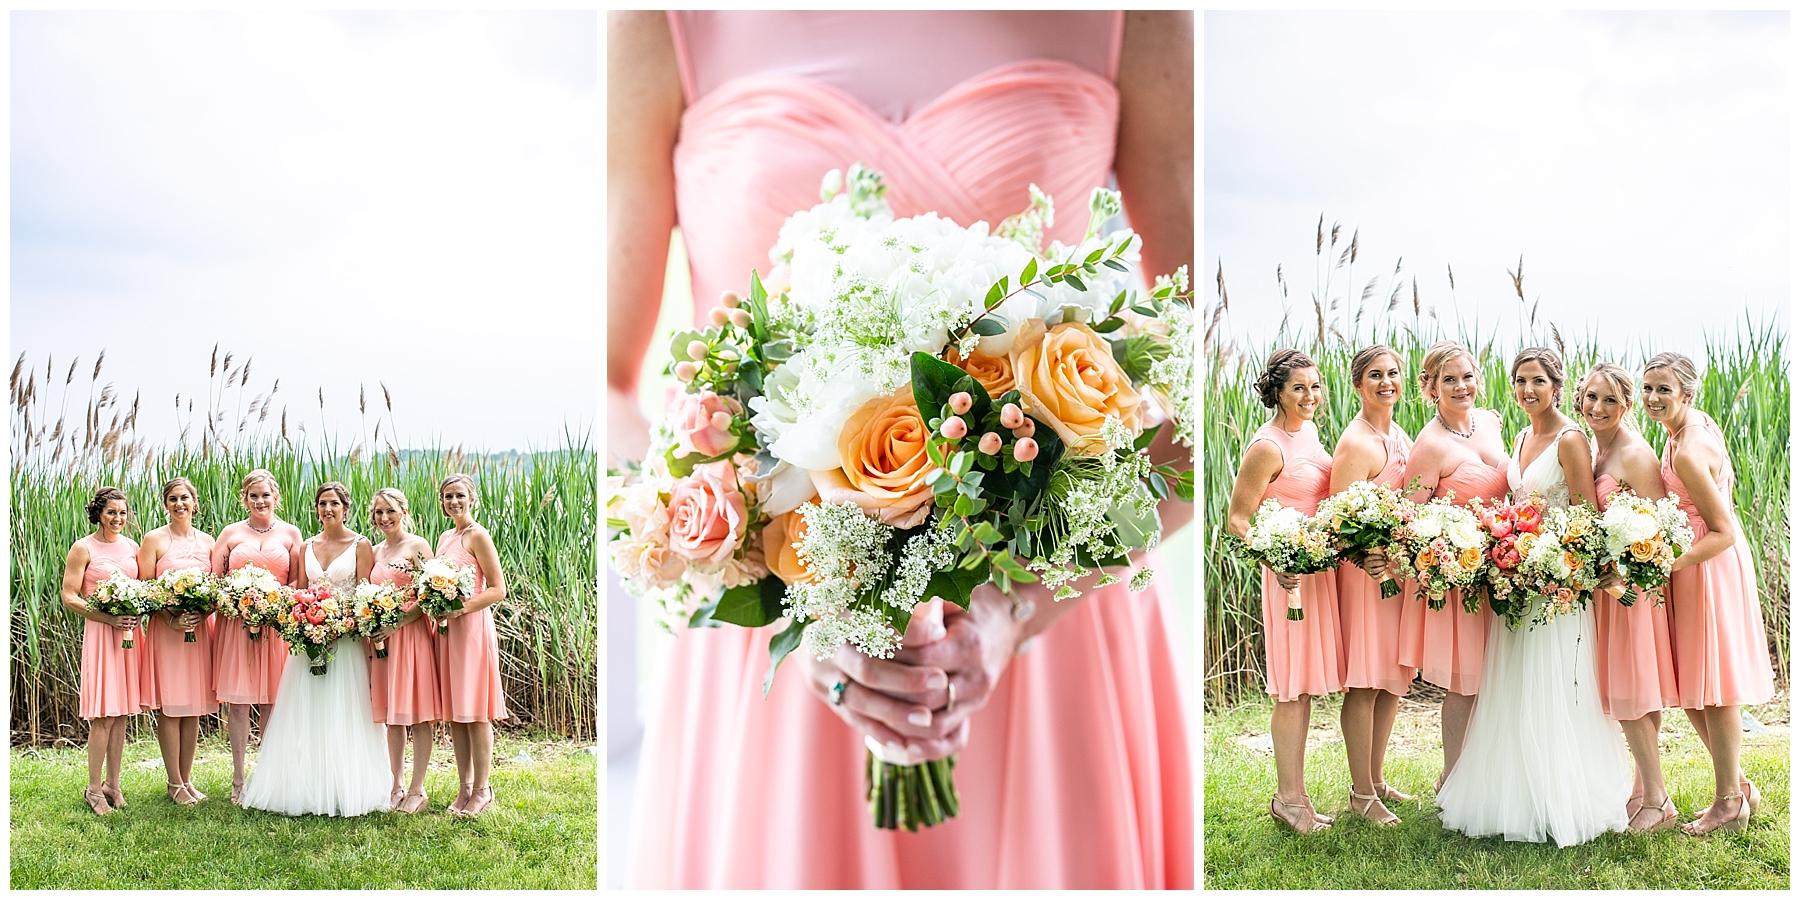 Chelsea Phil Bohemia River Overlook Wedding Living Radiant Photography photos_0060.jpg